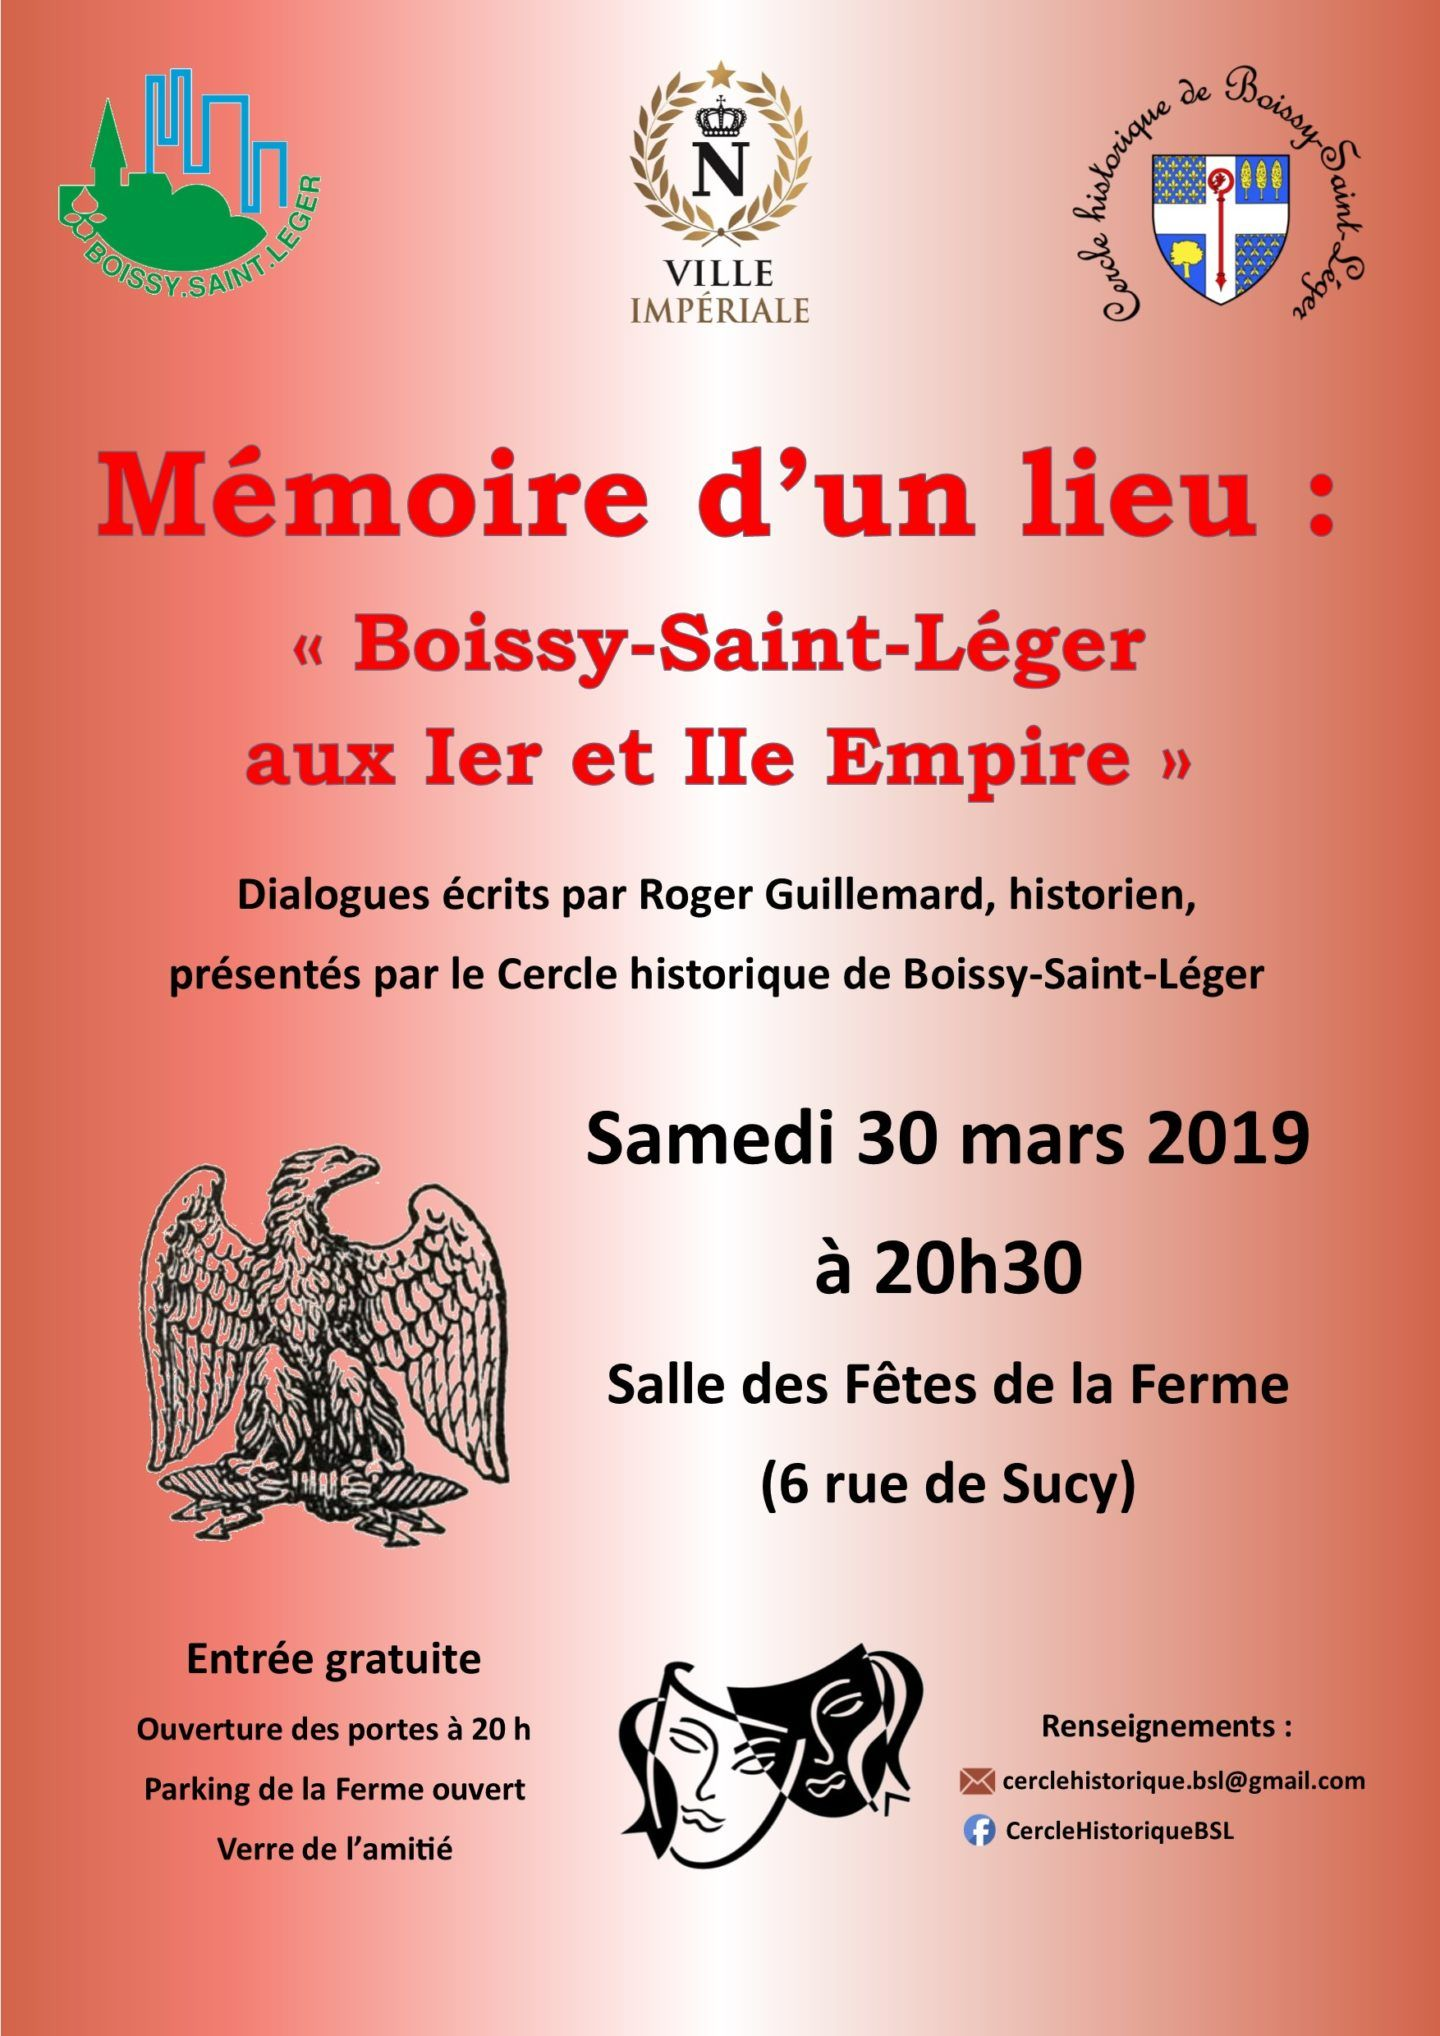 Affiche_memoire_lieu_Boissy_30mars2019